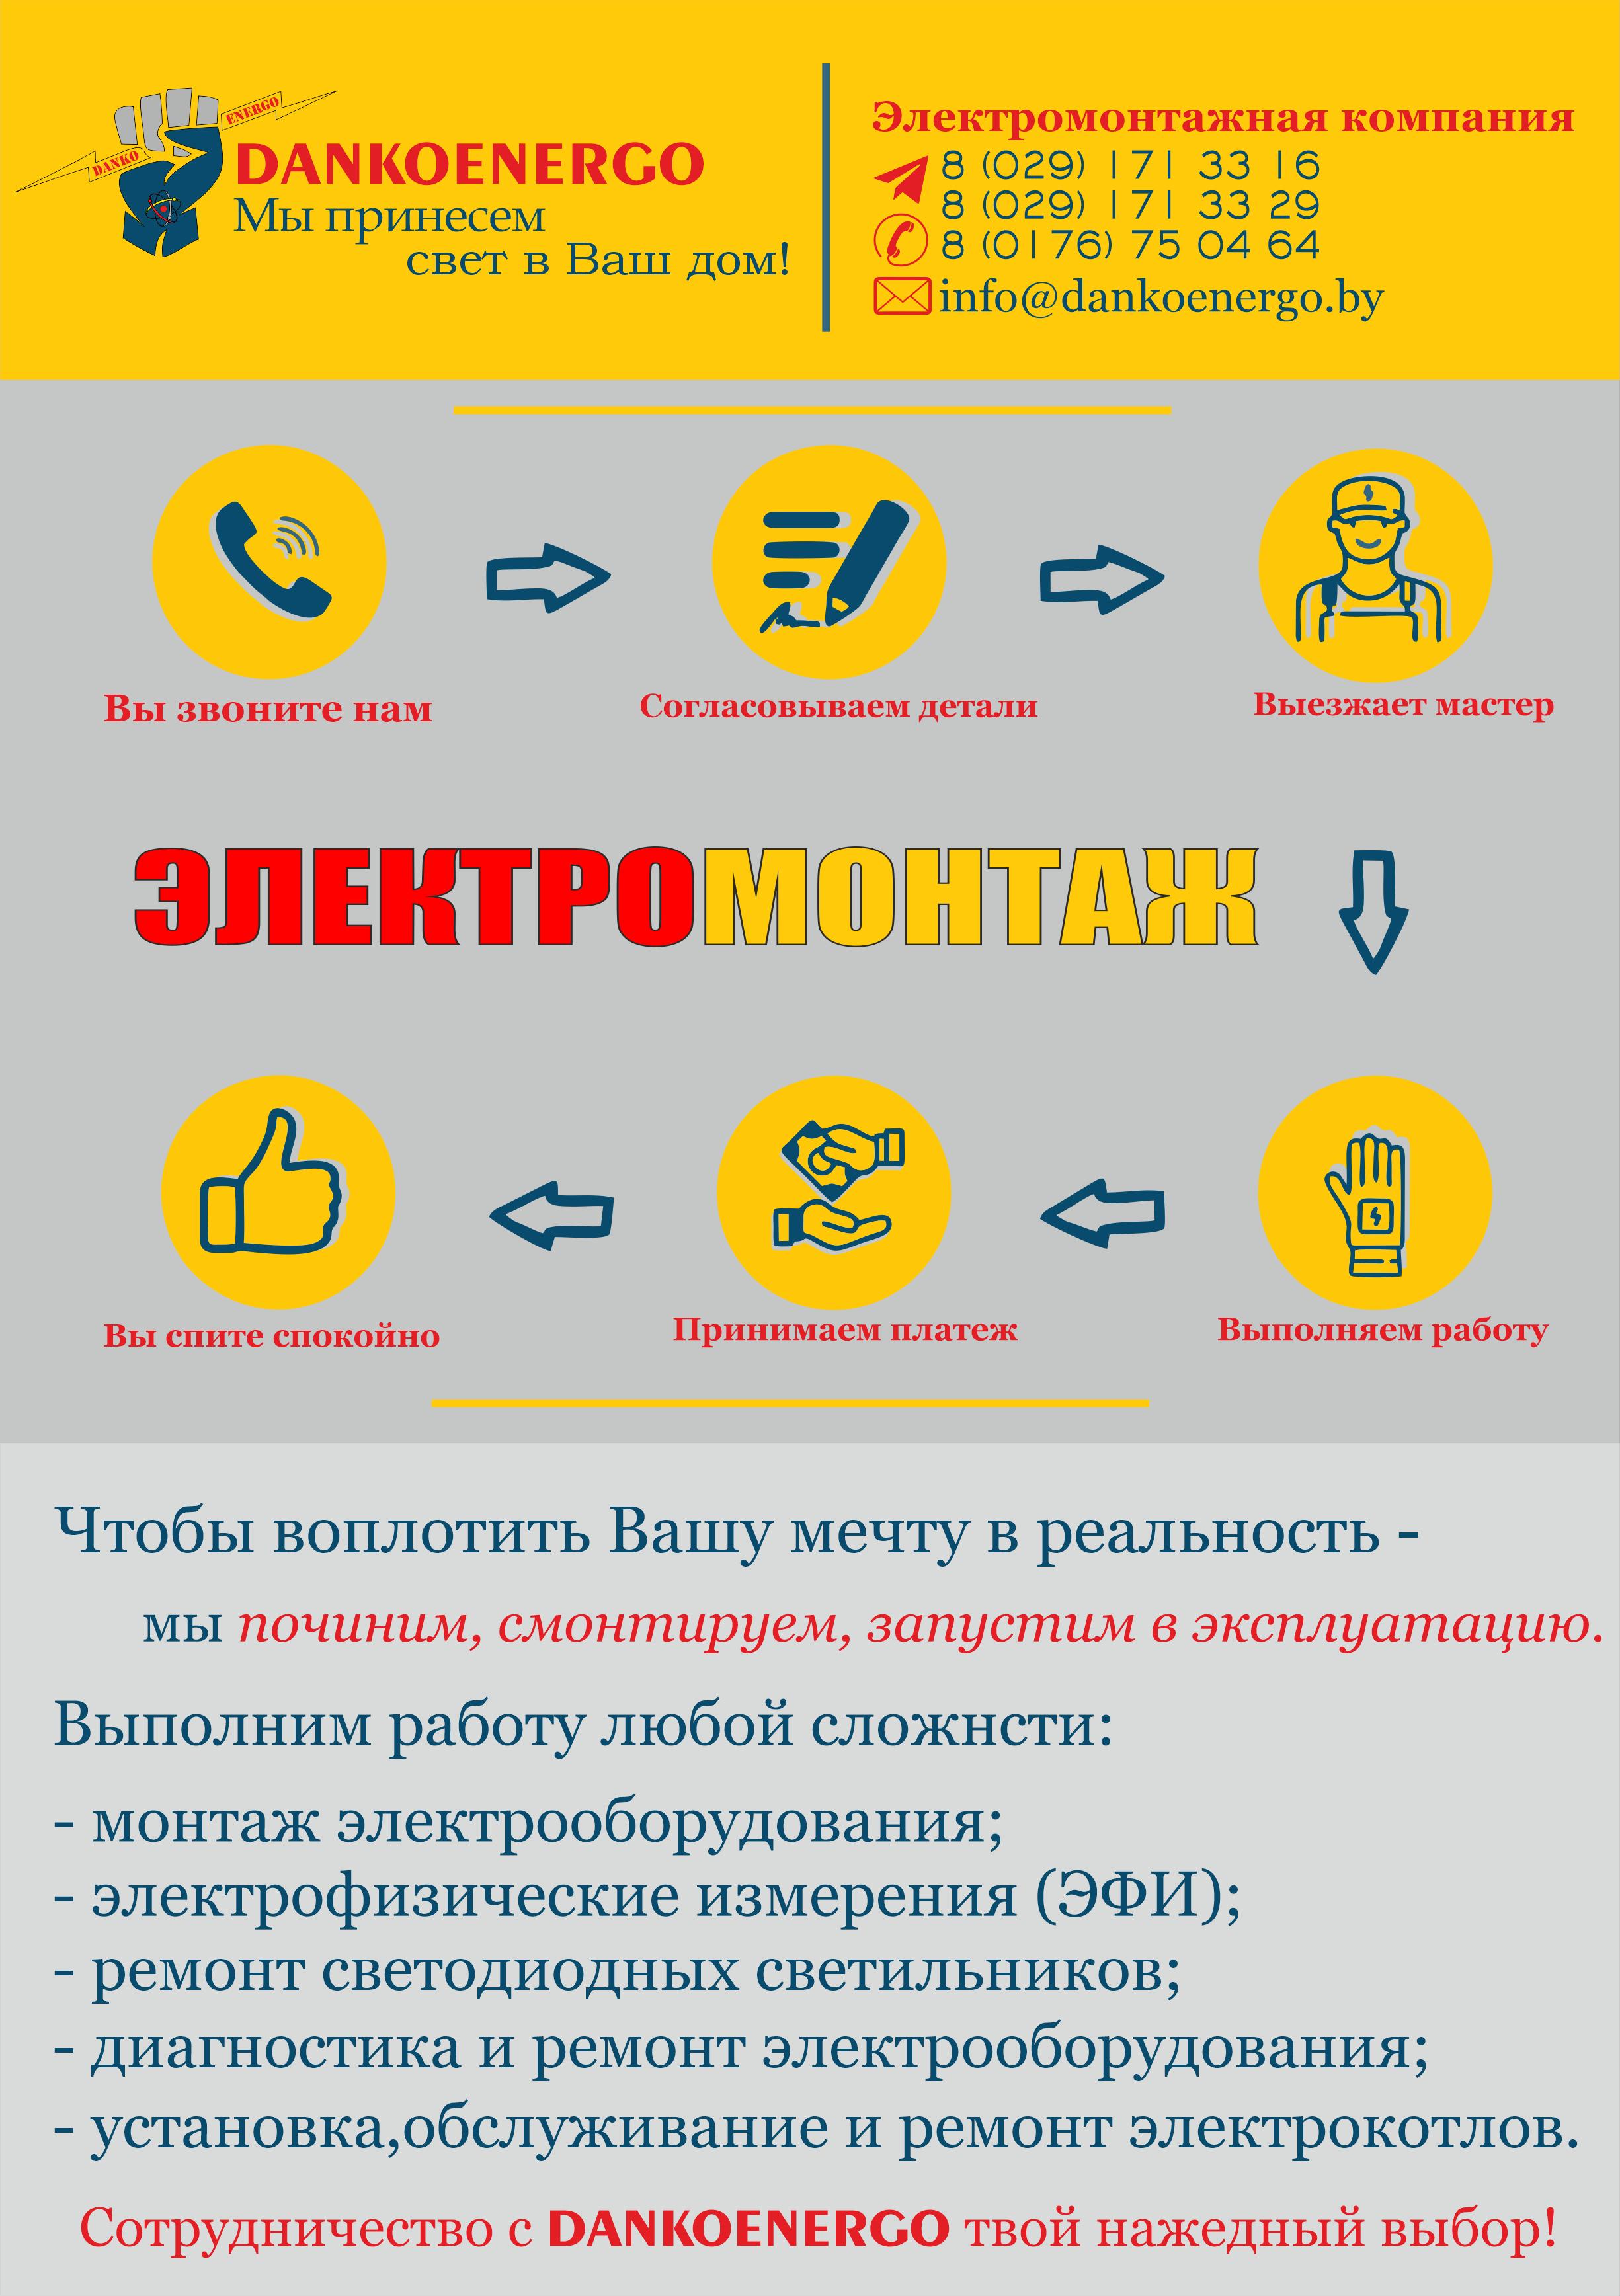 Электромонтаж И ЛЭФИ в Молодечно